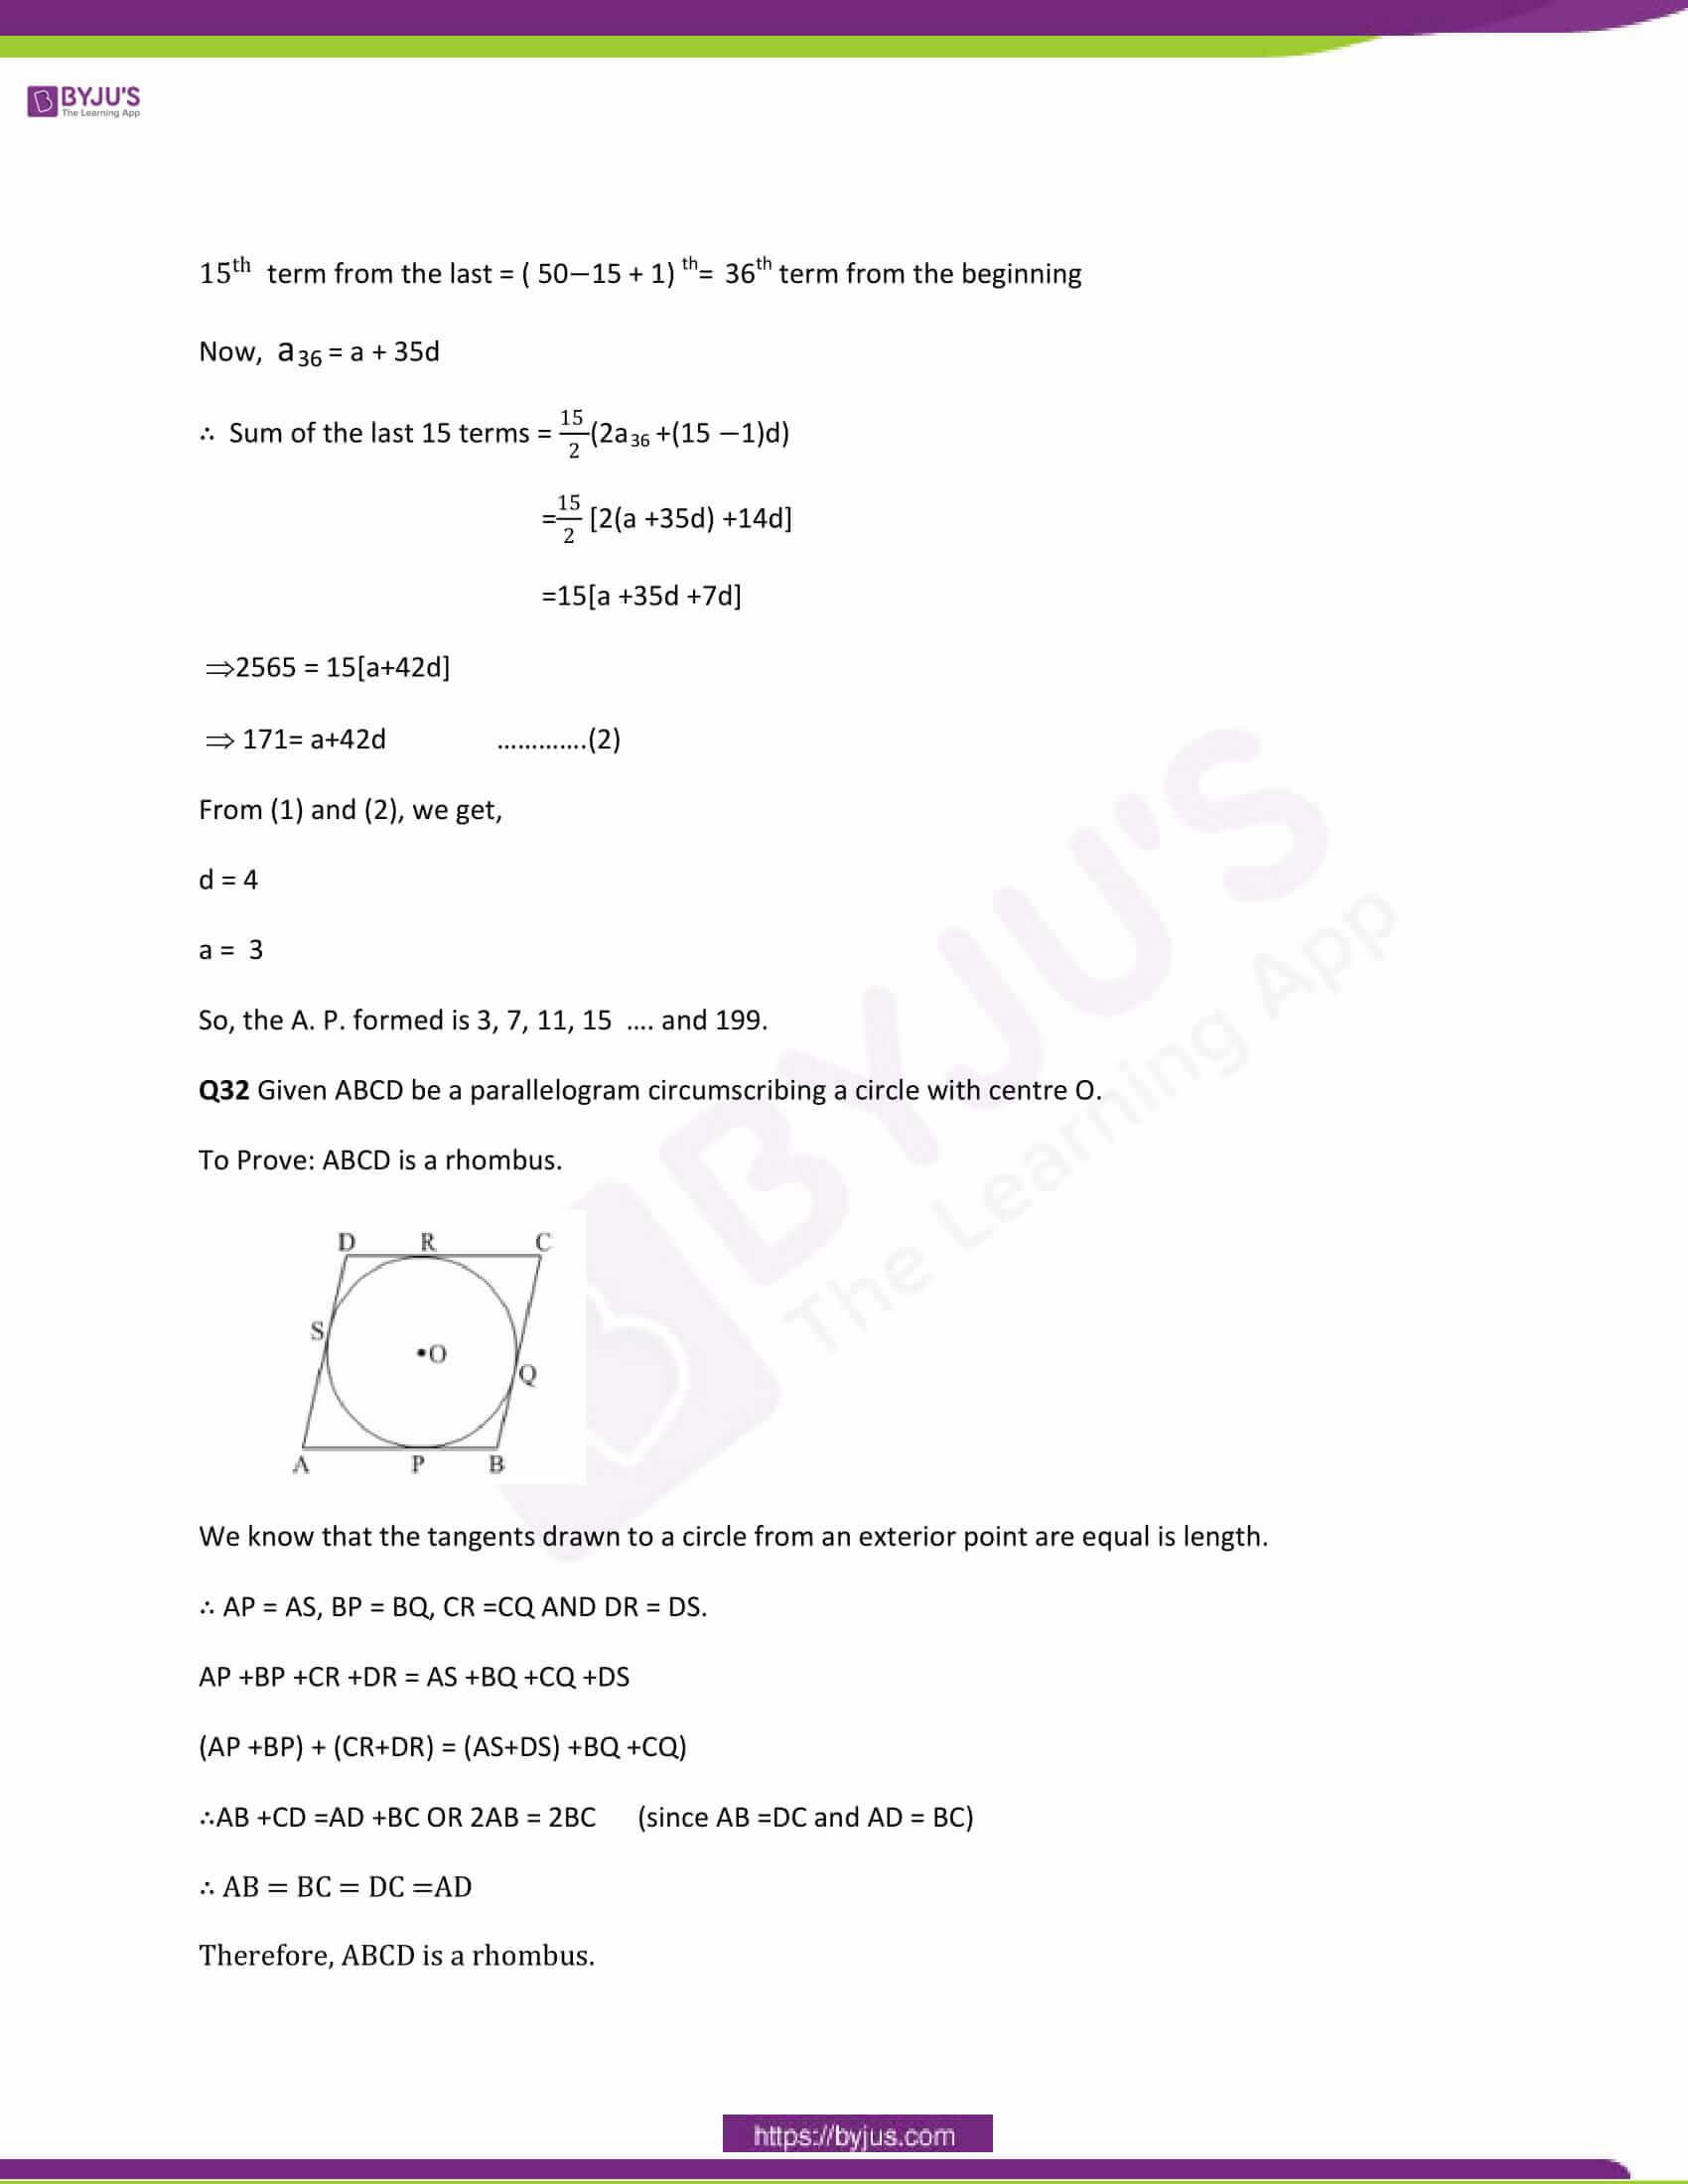 CBSE Class 10 Maths Papers Solution 2014 23